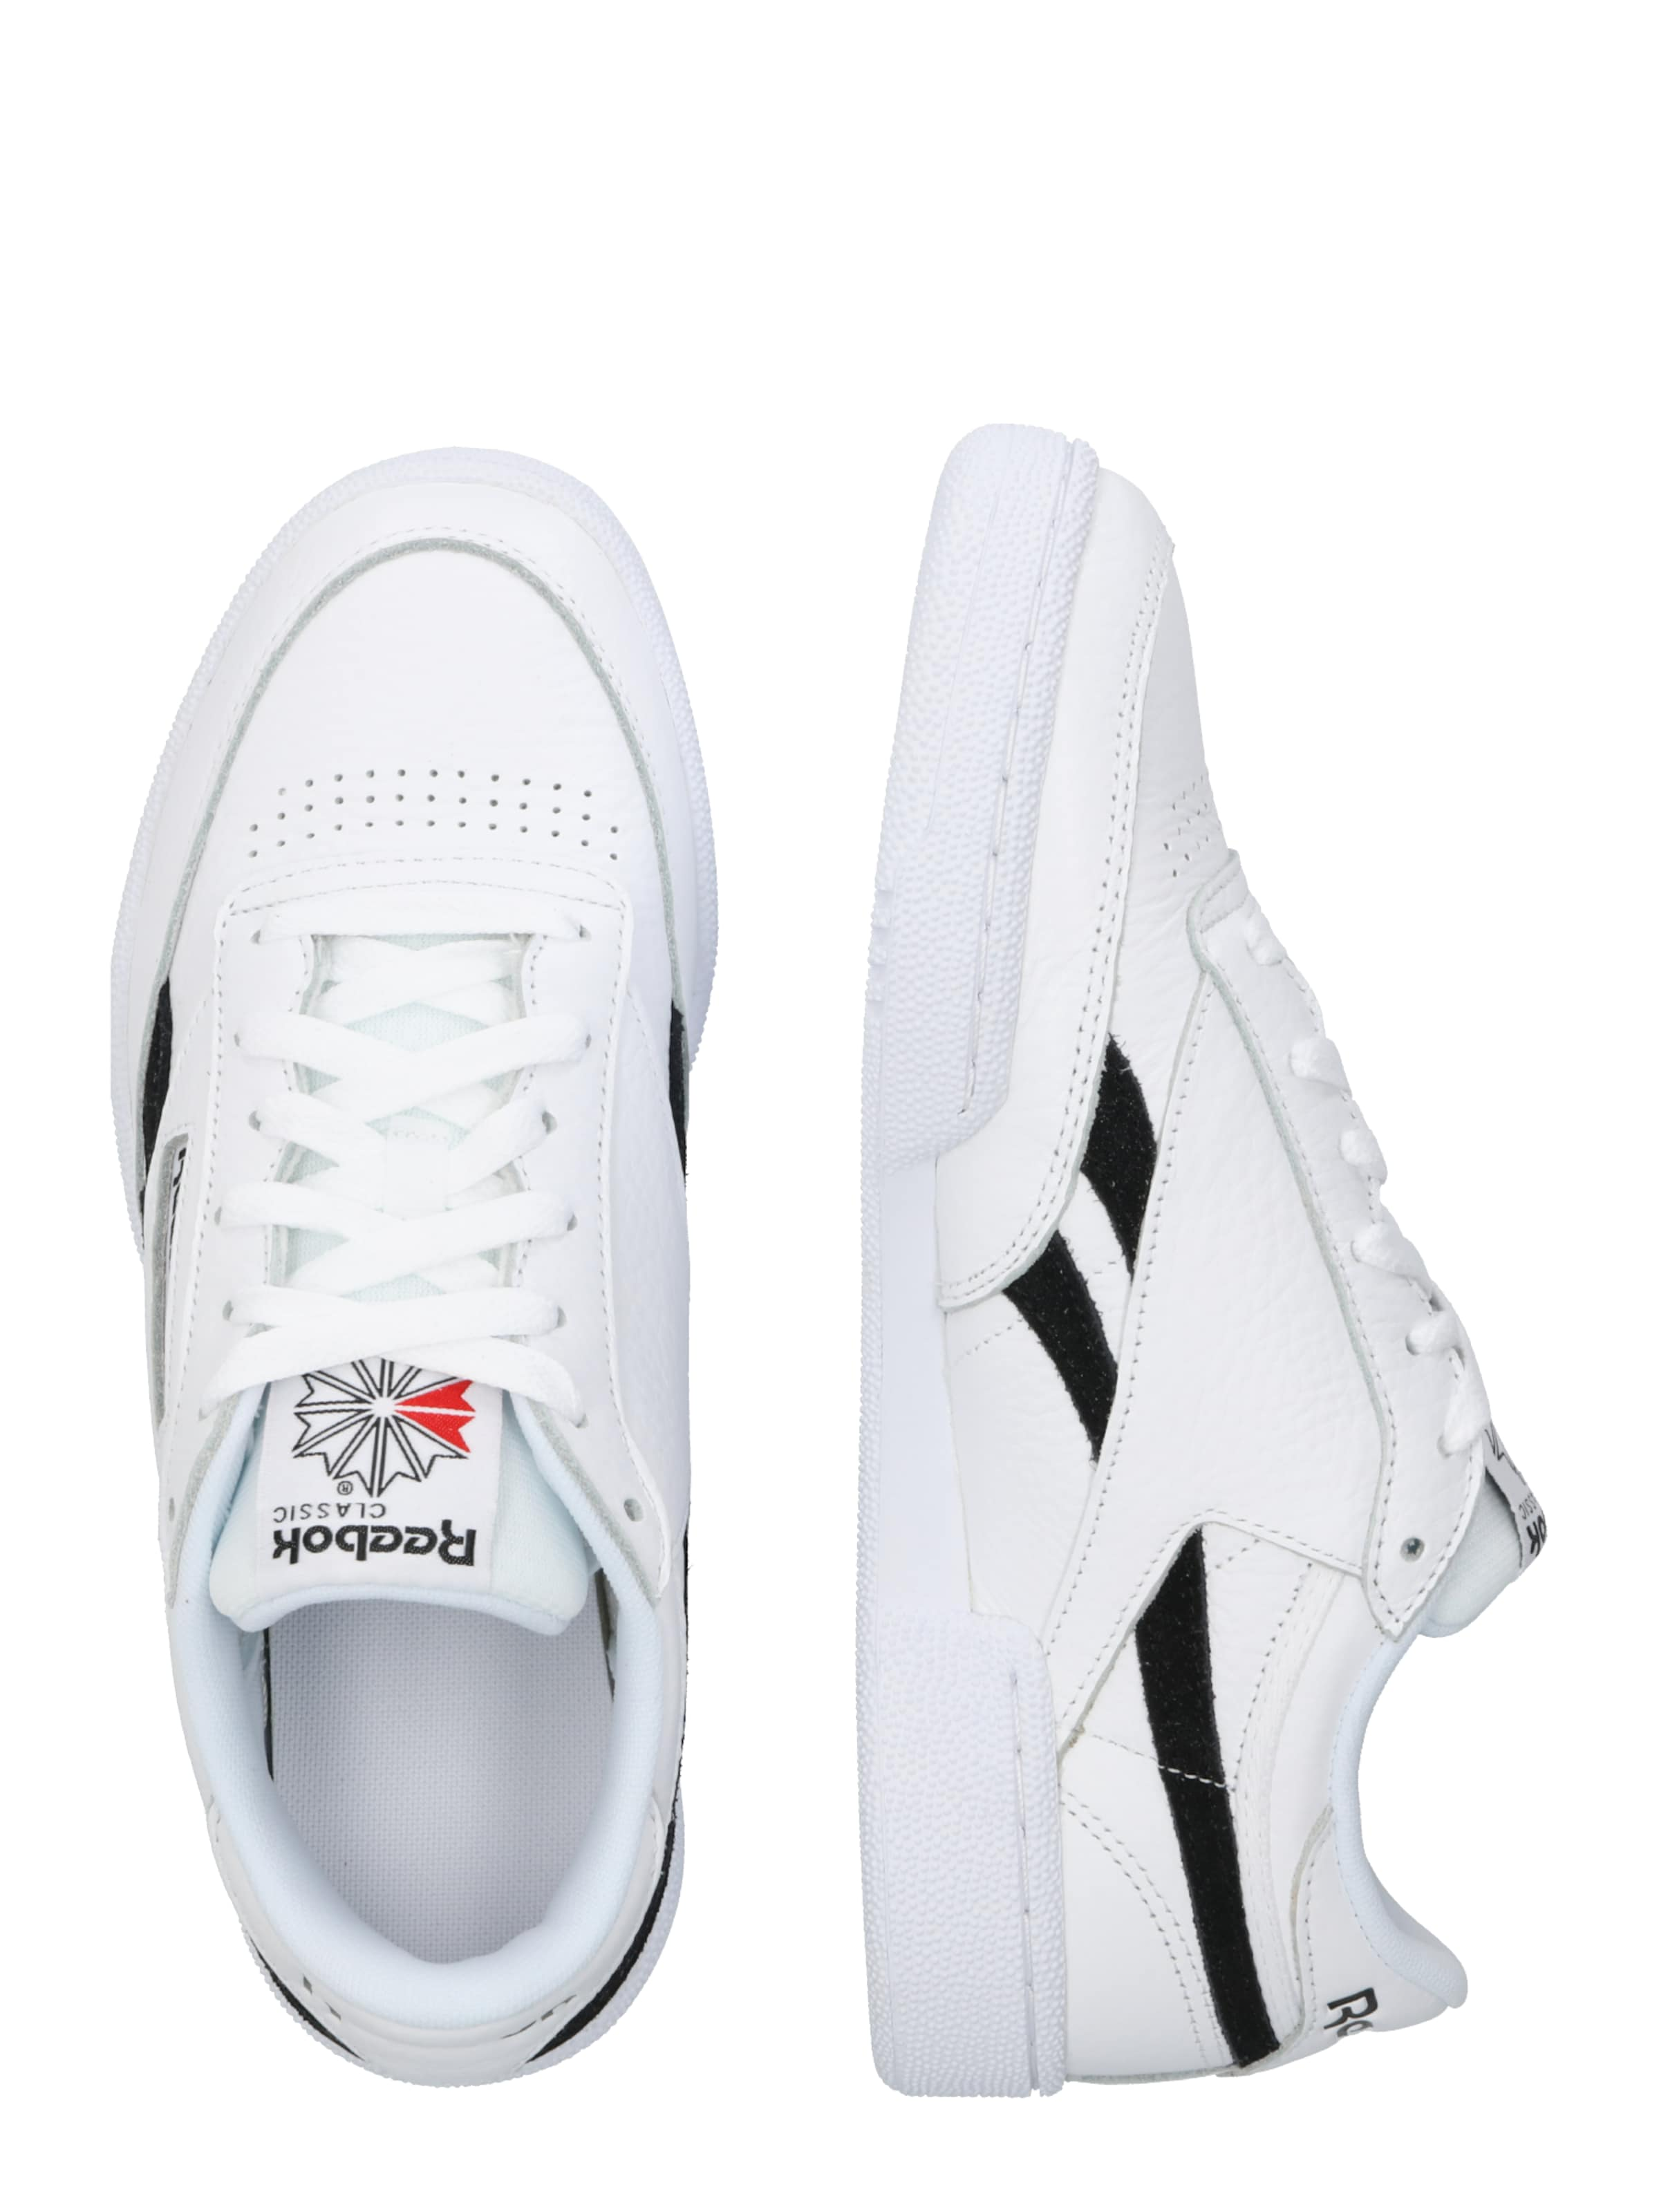 In 'revenge RotSchwarz Plus Classic Mu' Reebok Weiß Sneaker xCBedo